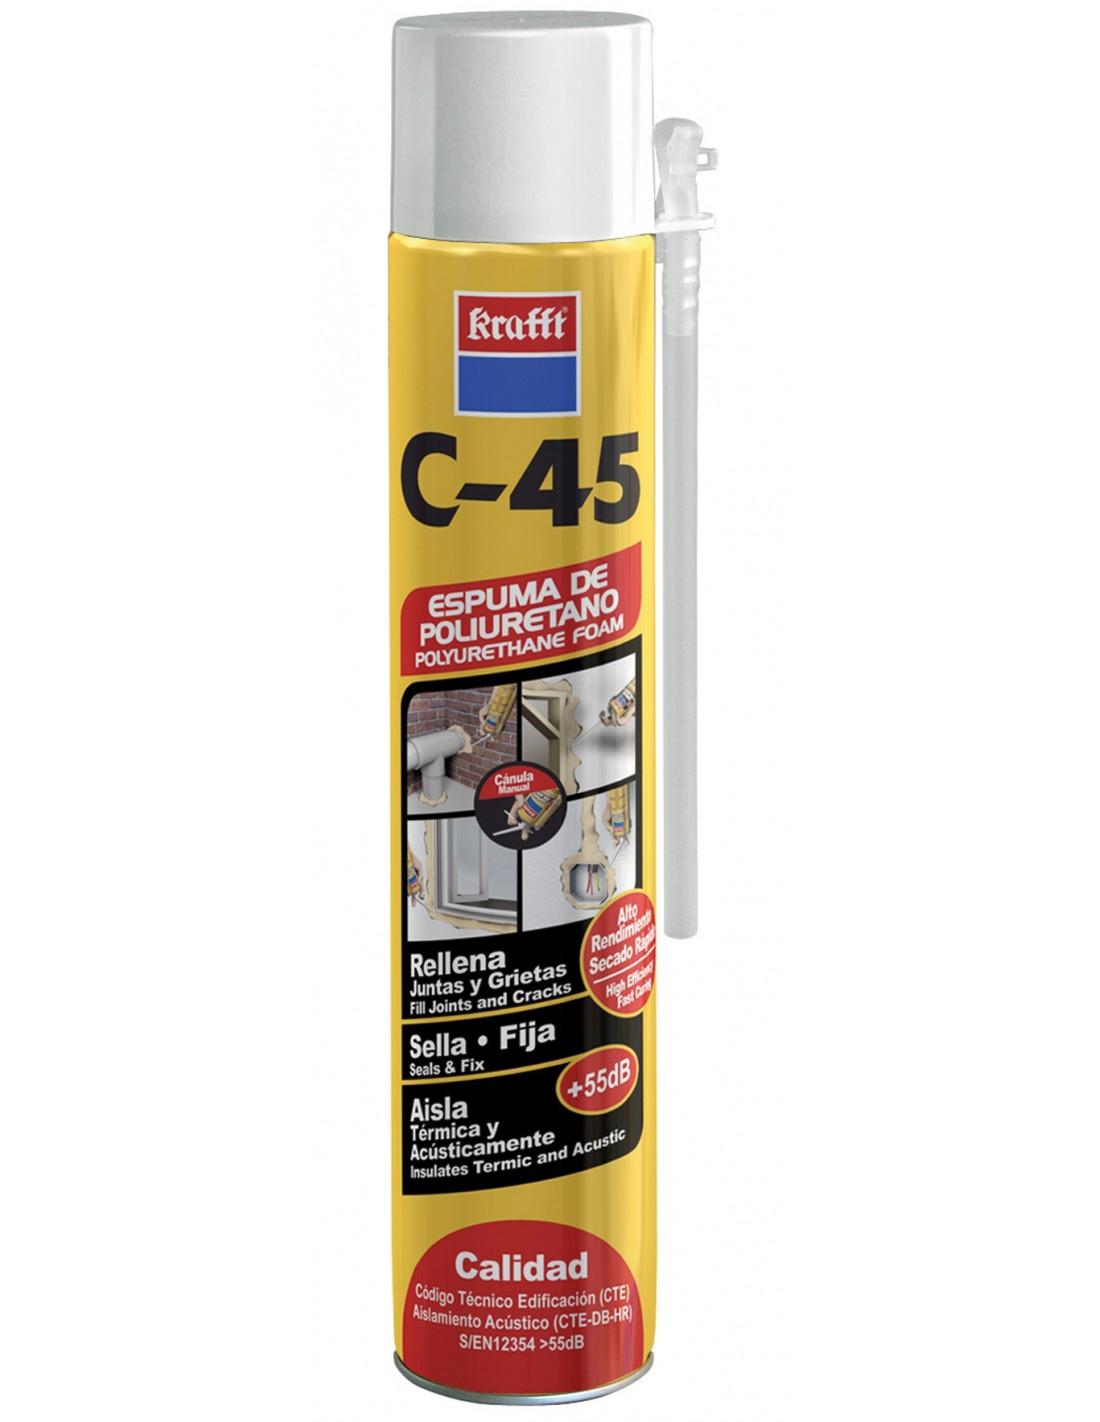 eac69ba3170 Espuma poliuretano Krafft C-45 750 ml